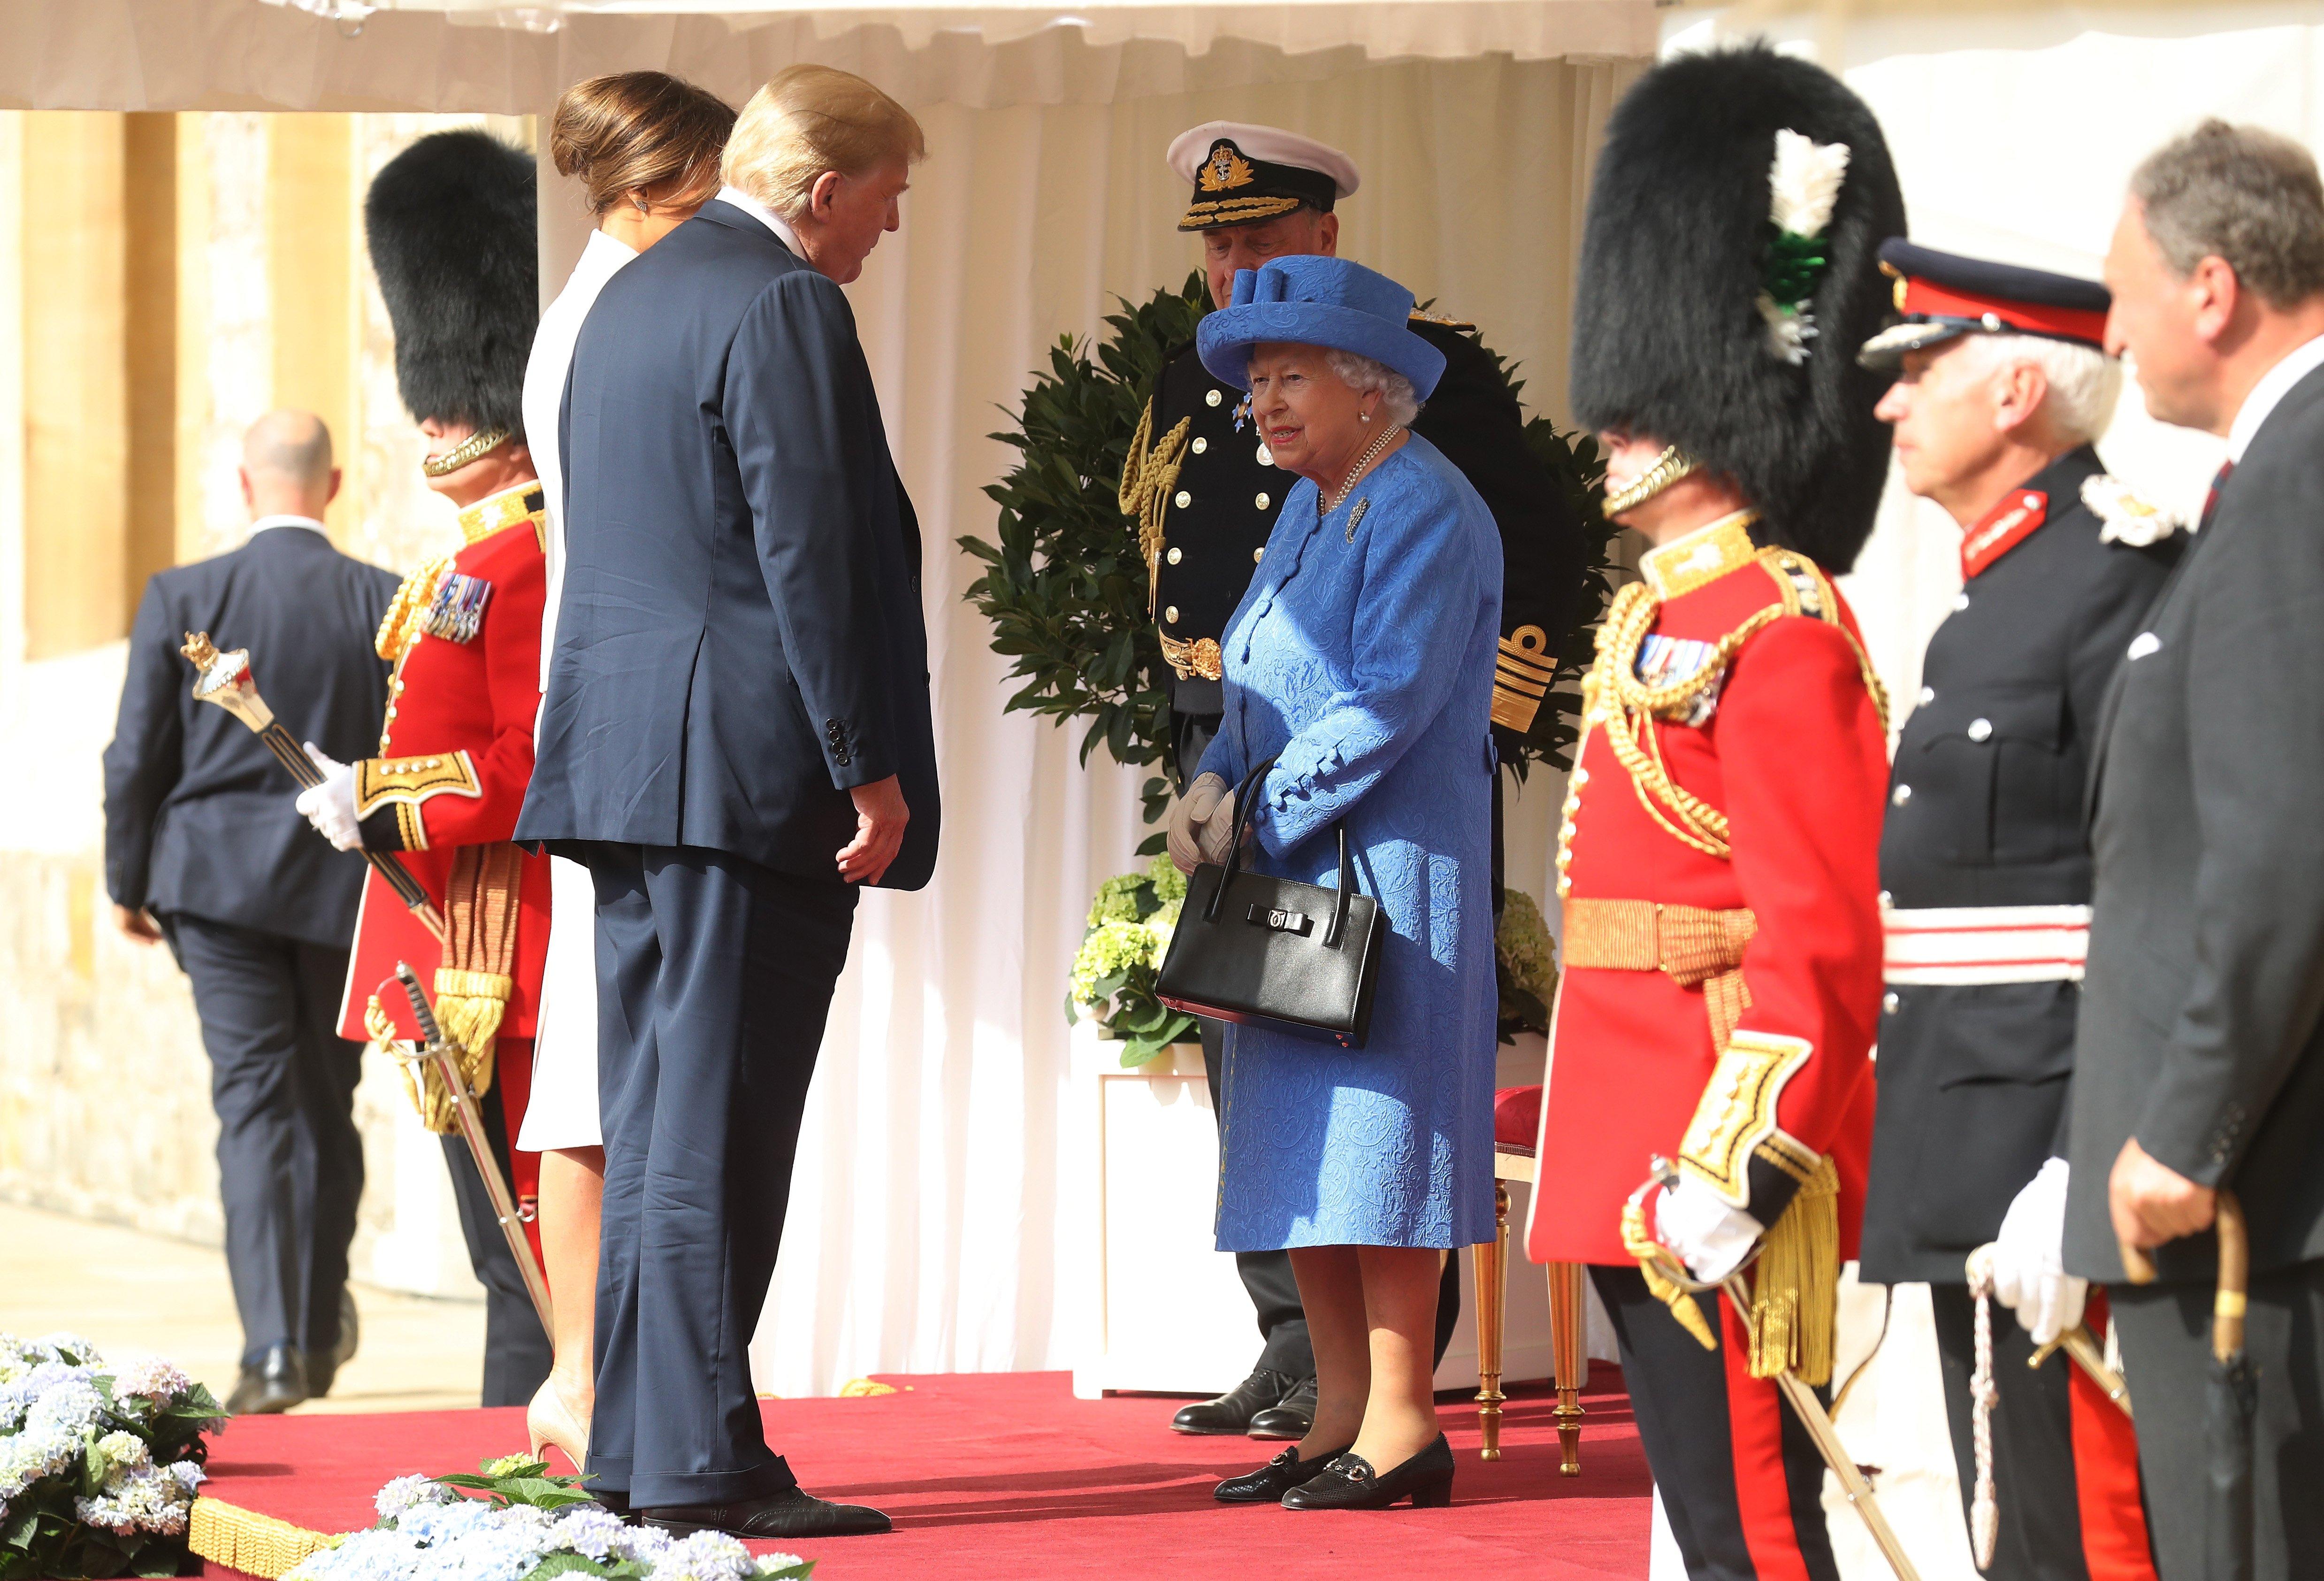 gettyimages 997851916.jpg?resize=300,169 - Trump comete gafes durante encontro com a rainha Elizabeth